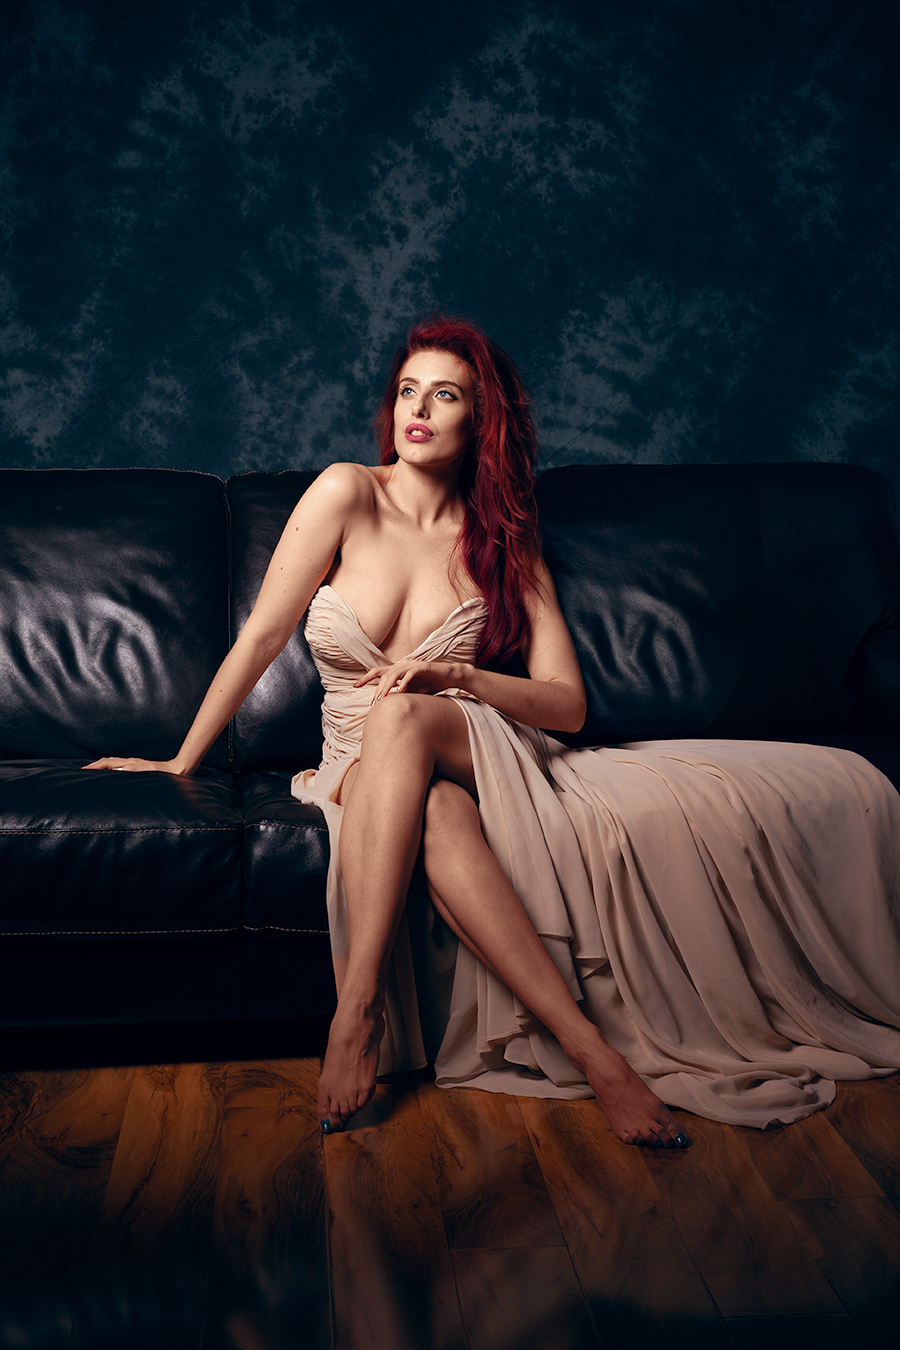 Photography by PhilM, Model Arabella, Taken at YorkPhotoStudio / Uploaded 23rd April 2019 @ 01:22 PM